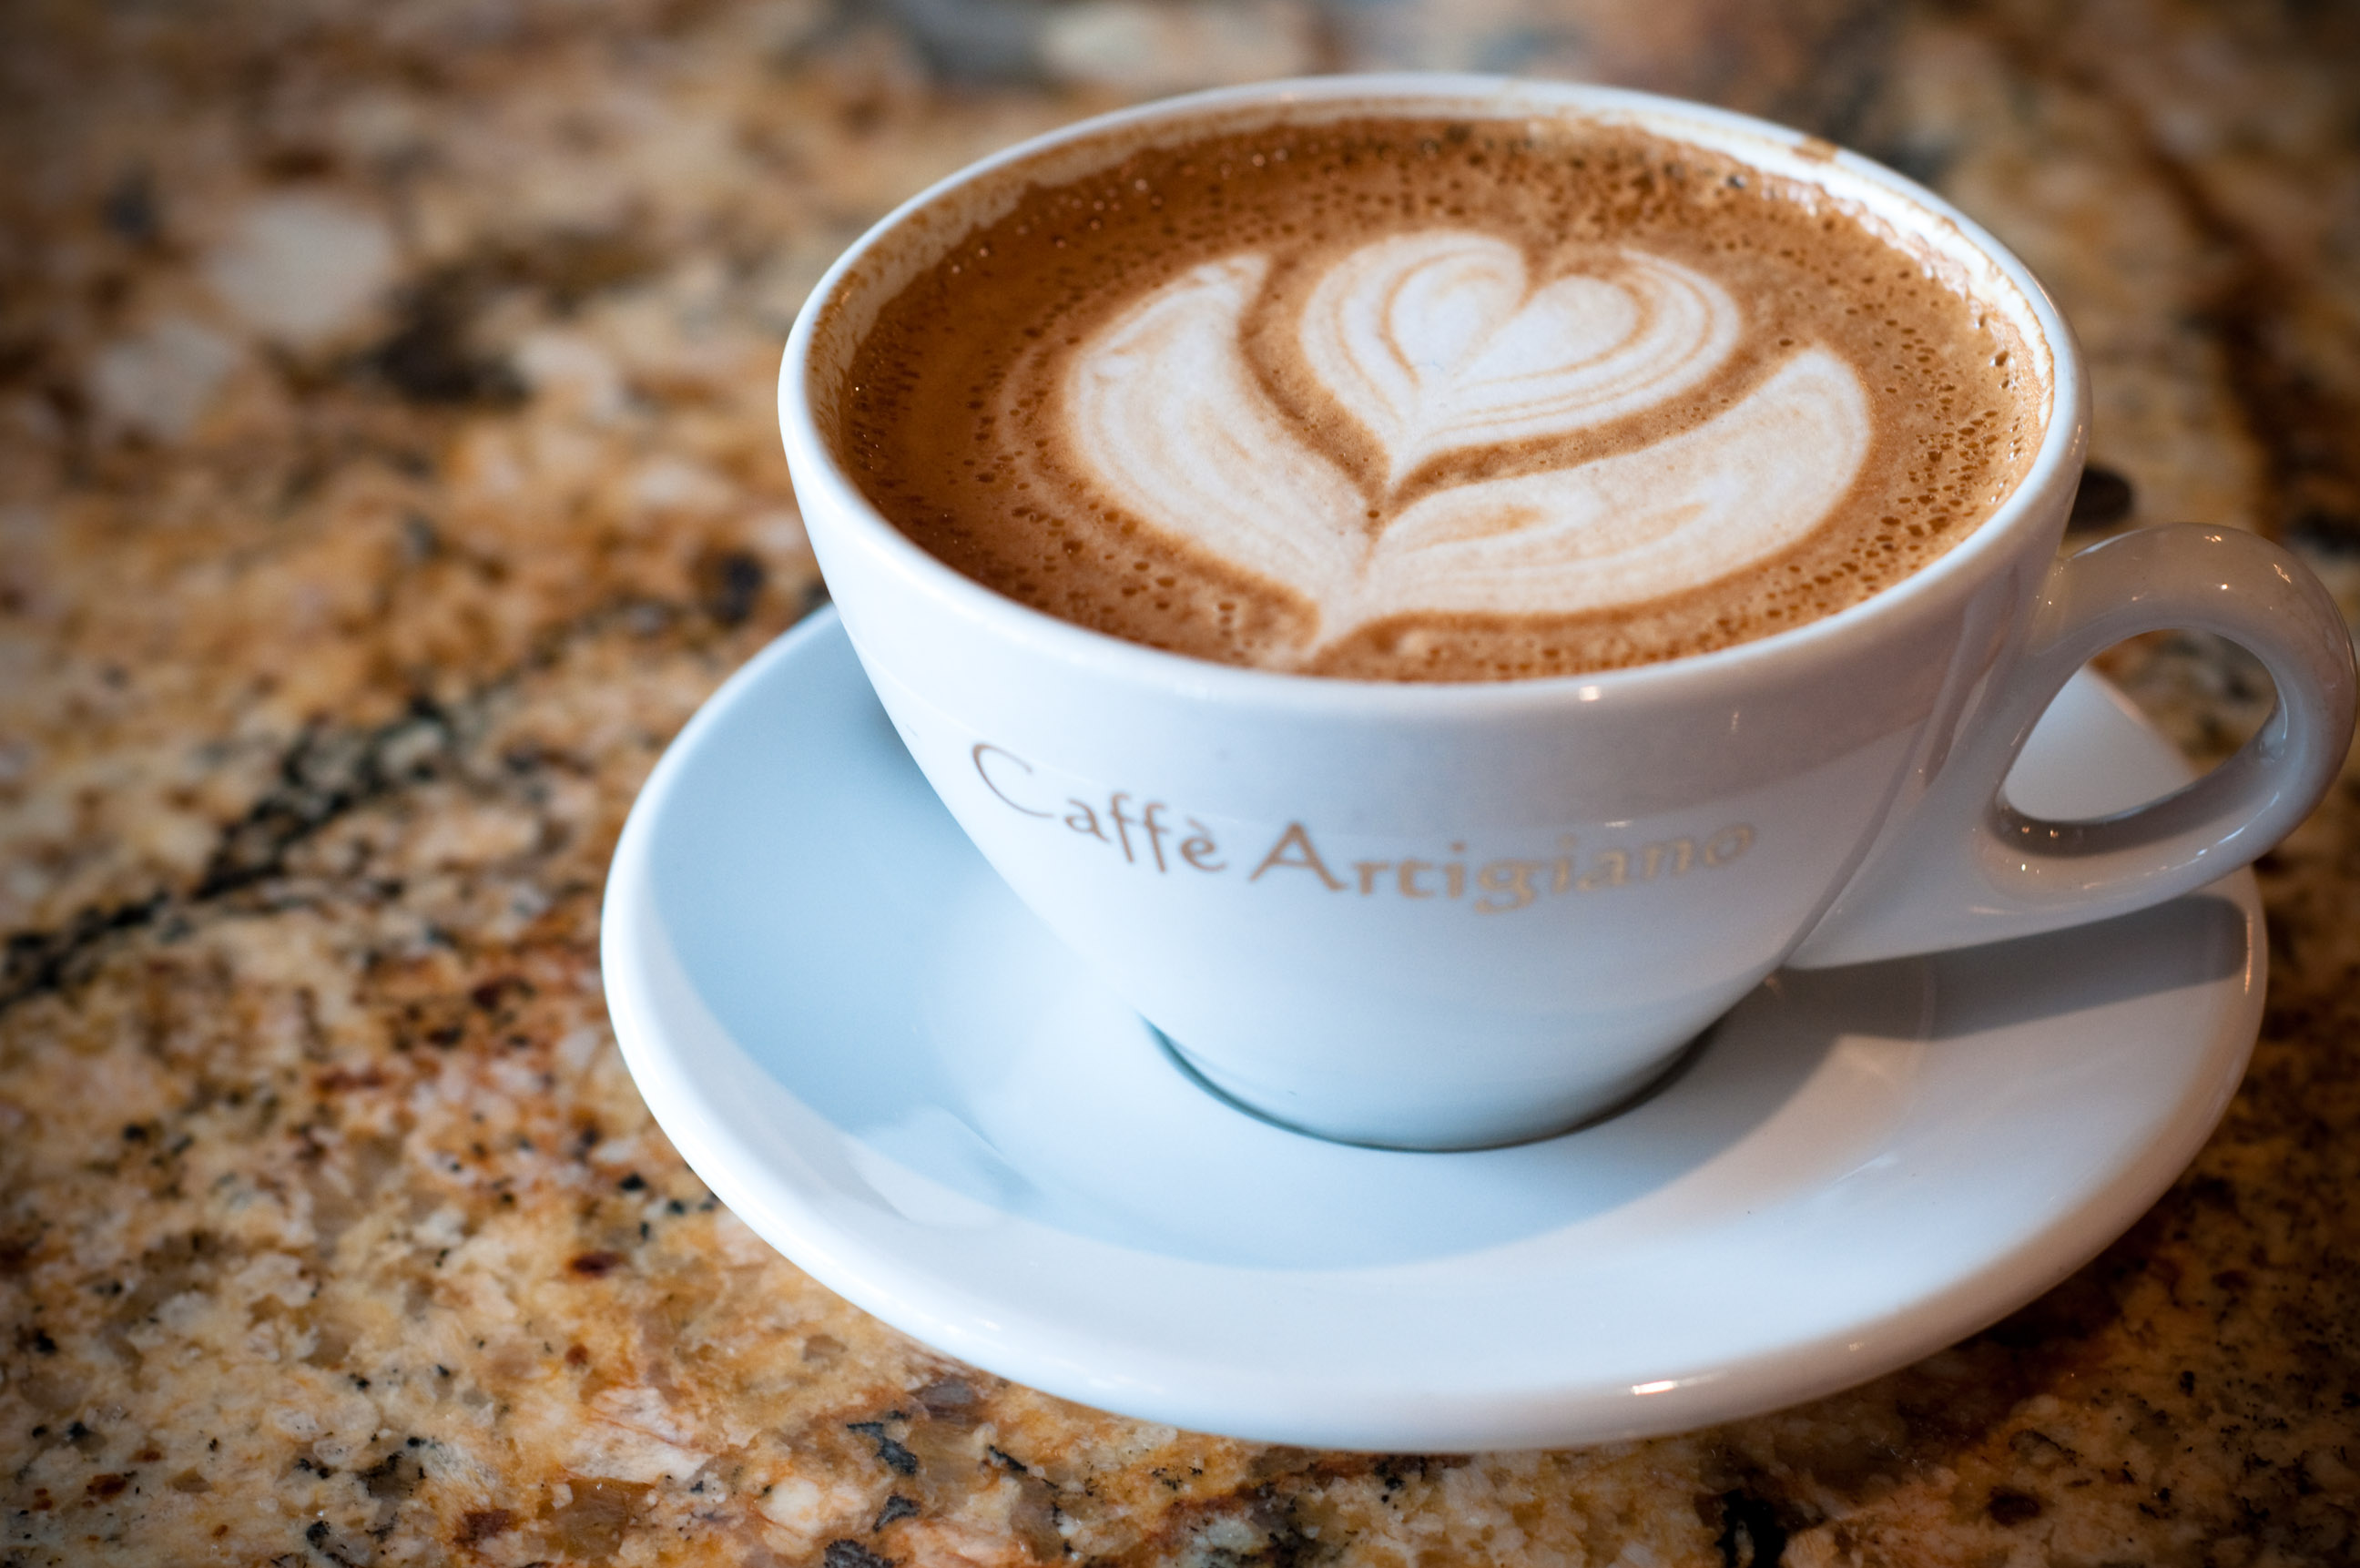 https://medivizor.com/blog/wp-content/uploads/2016/01/Coffee_break.jpg